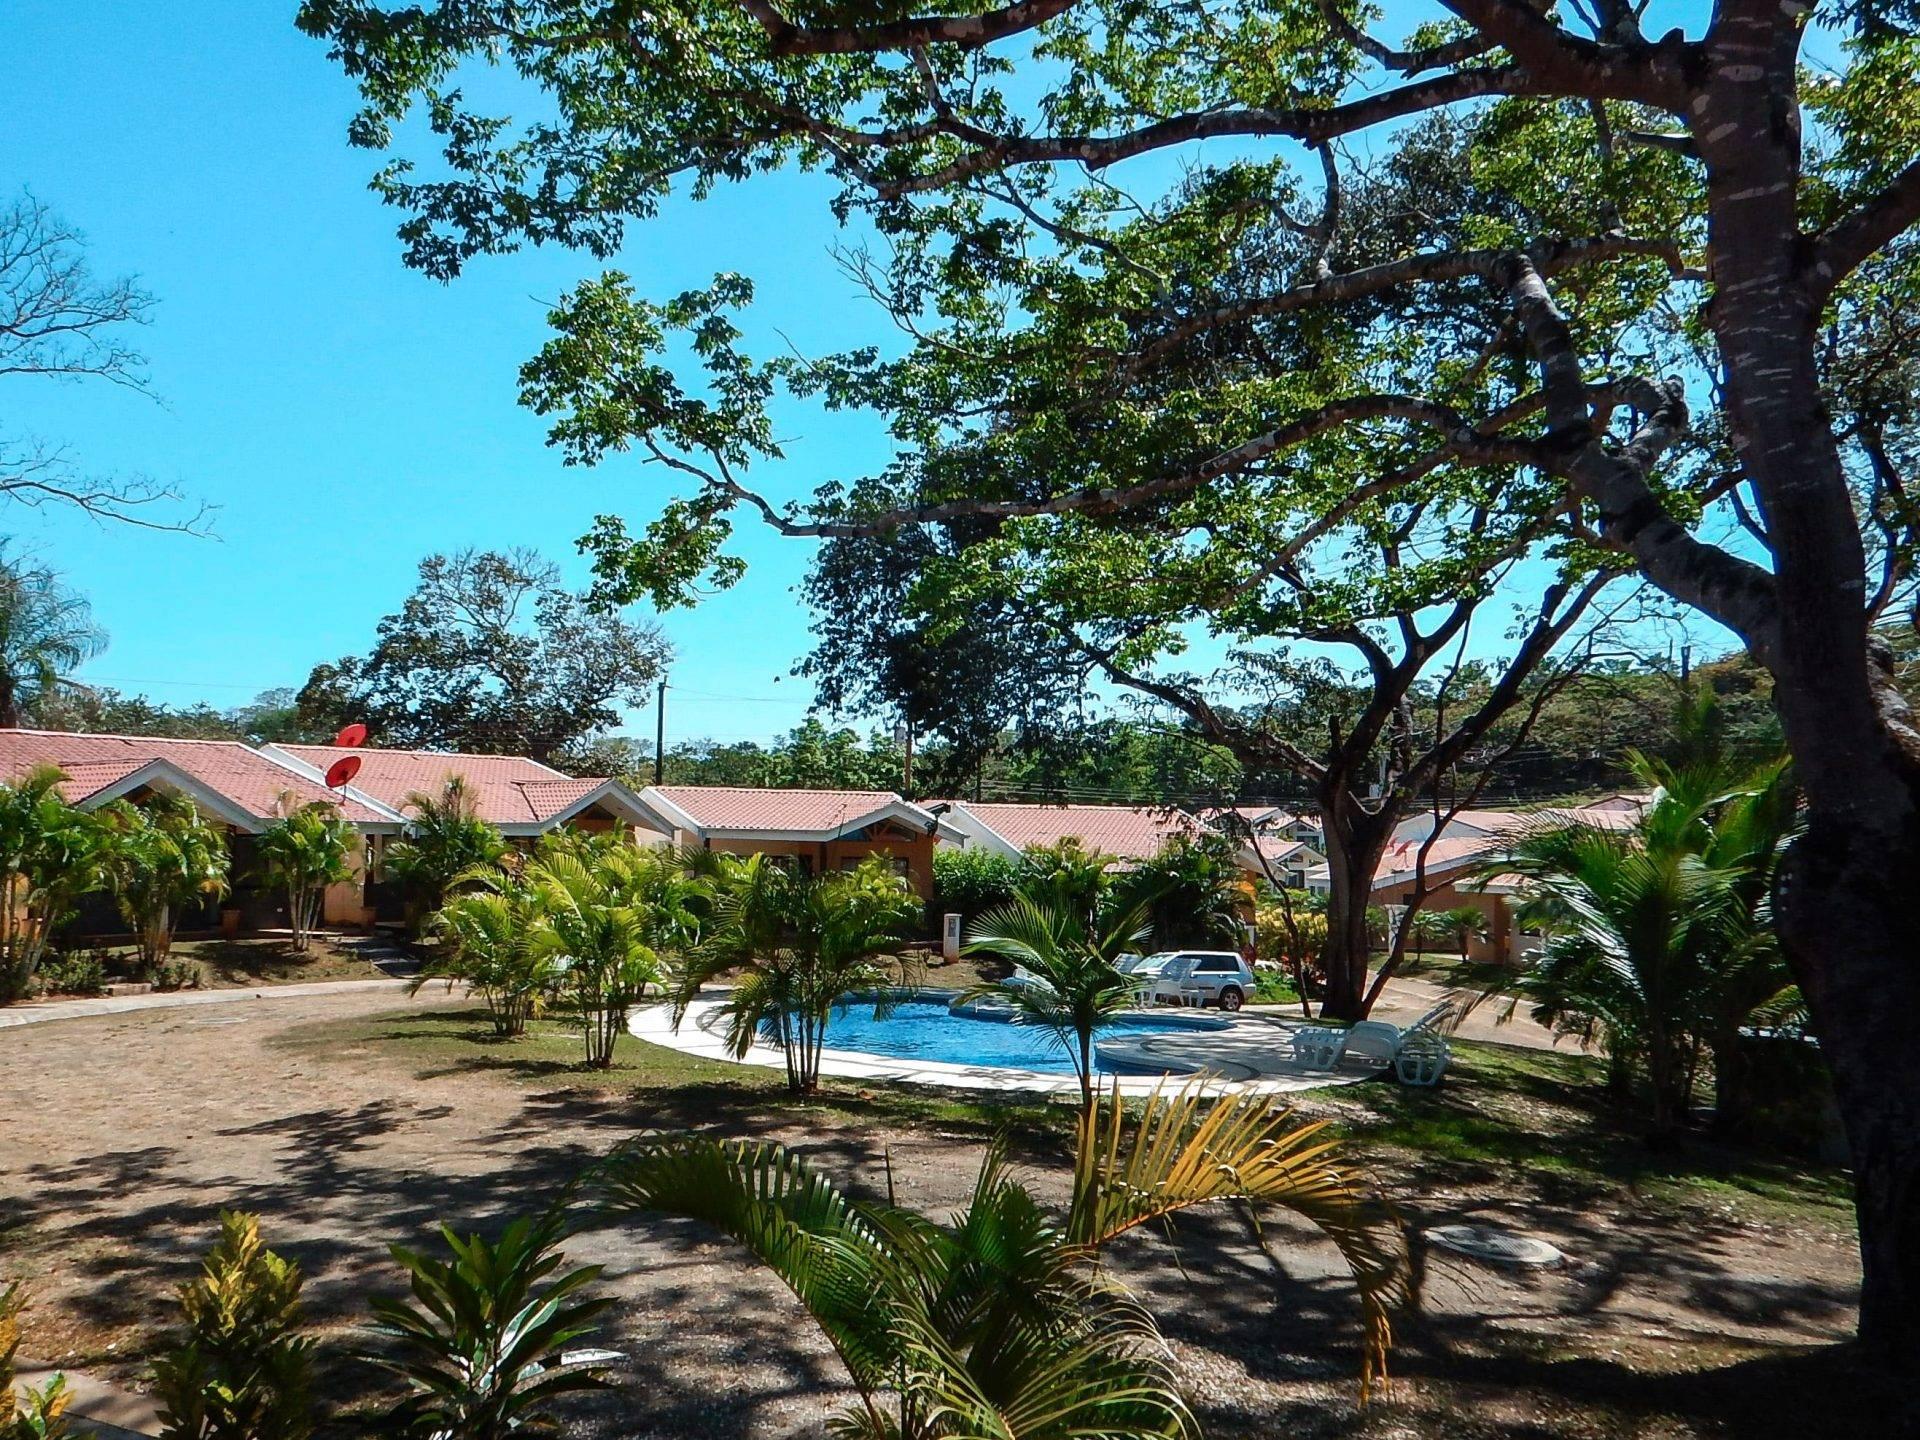 Villa Feliz at Lagarto Eco Development properties of Costa Rica